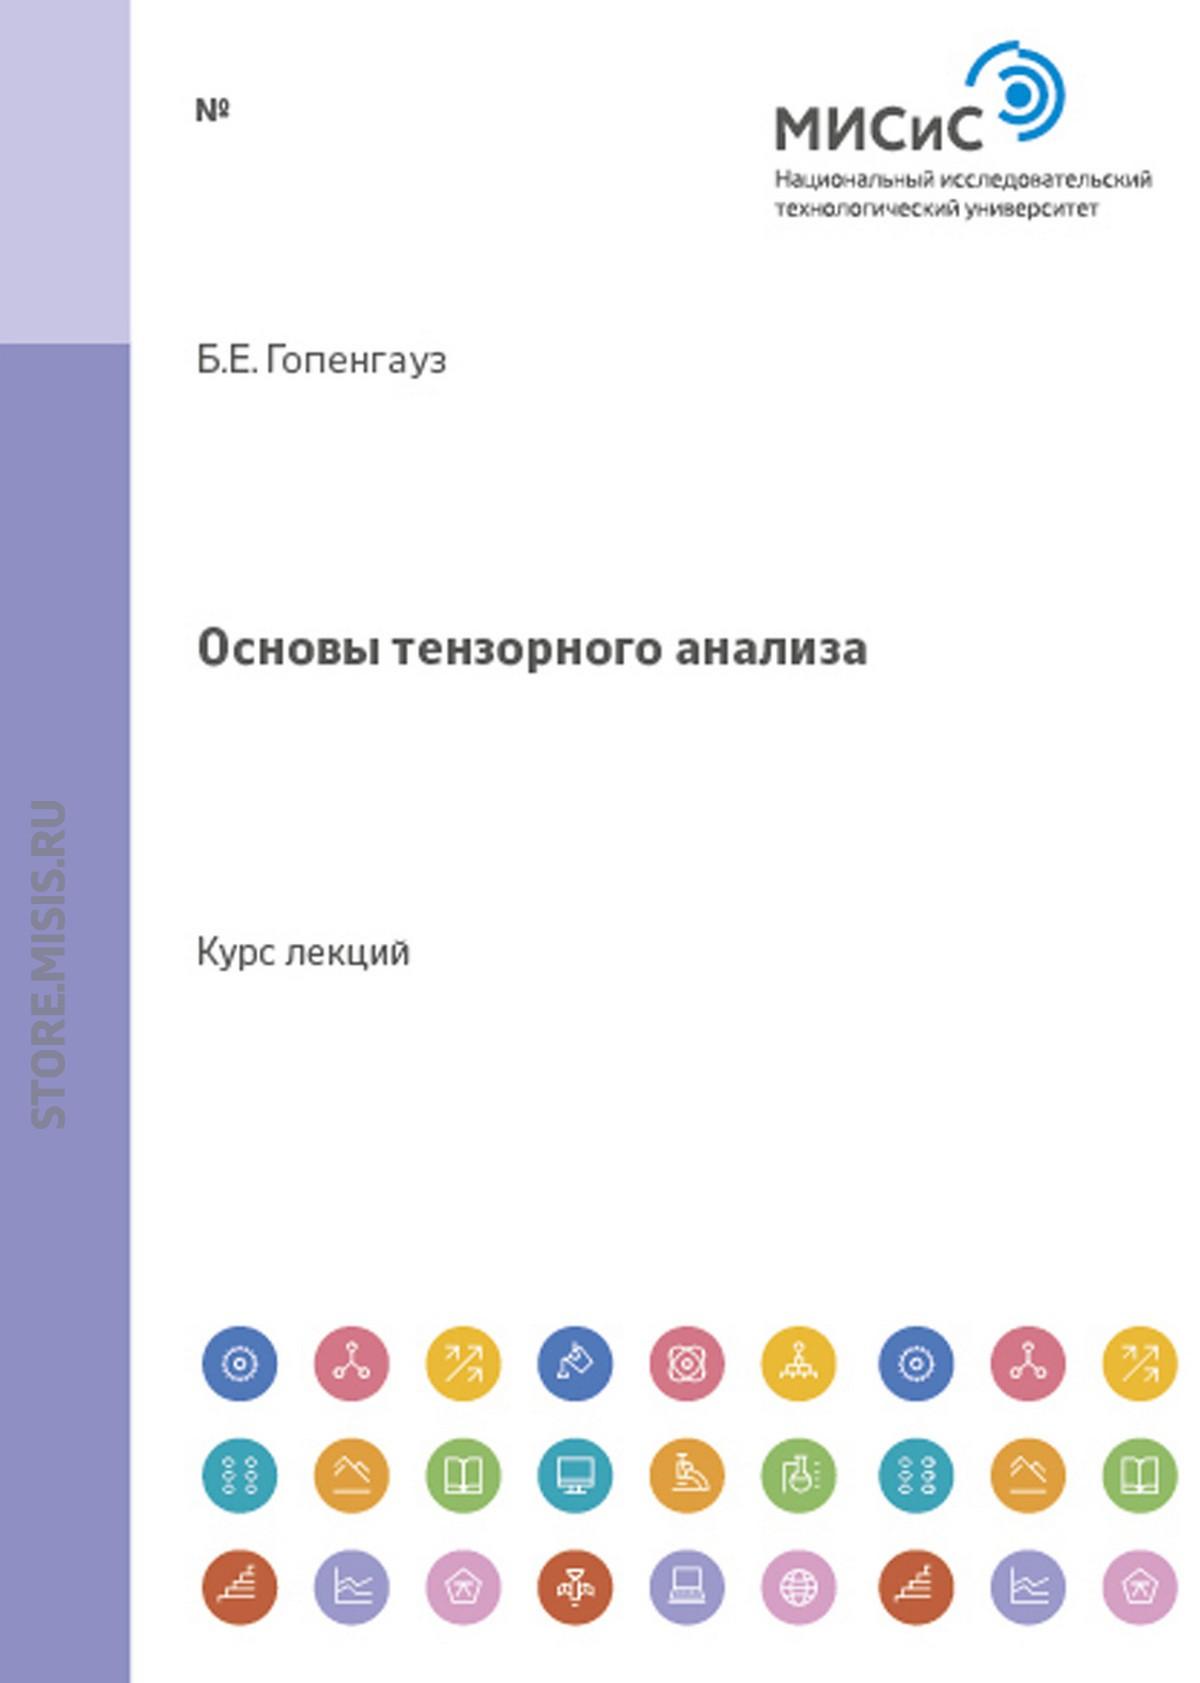 Борис Гопенгауз Основы тензорного анализа